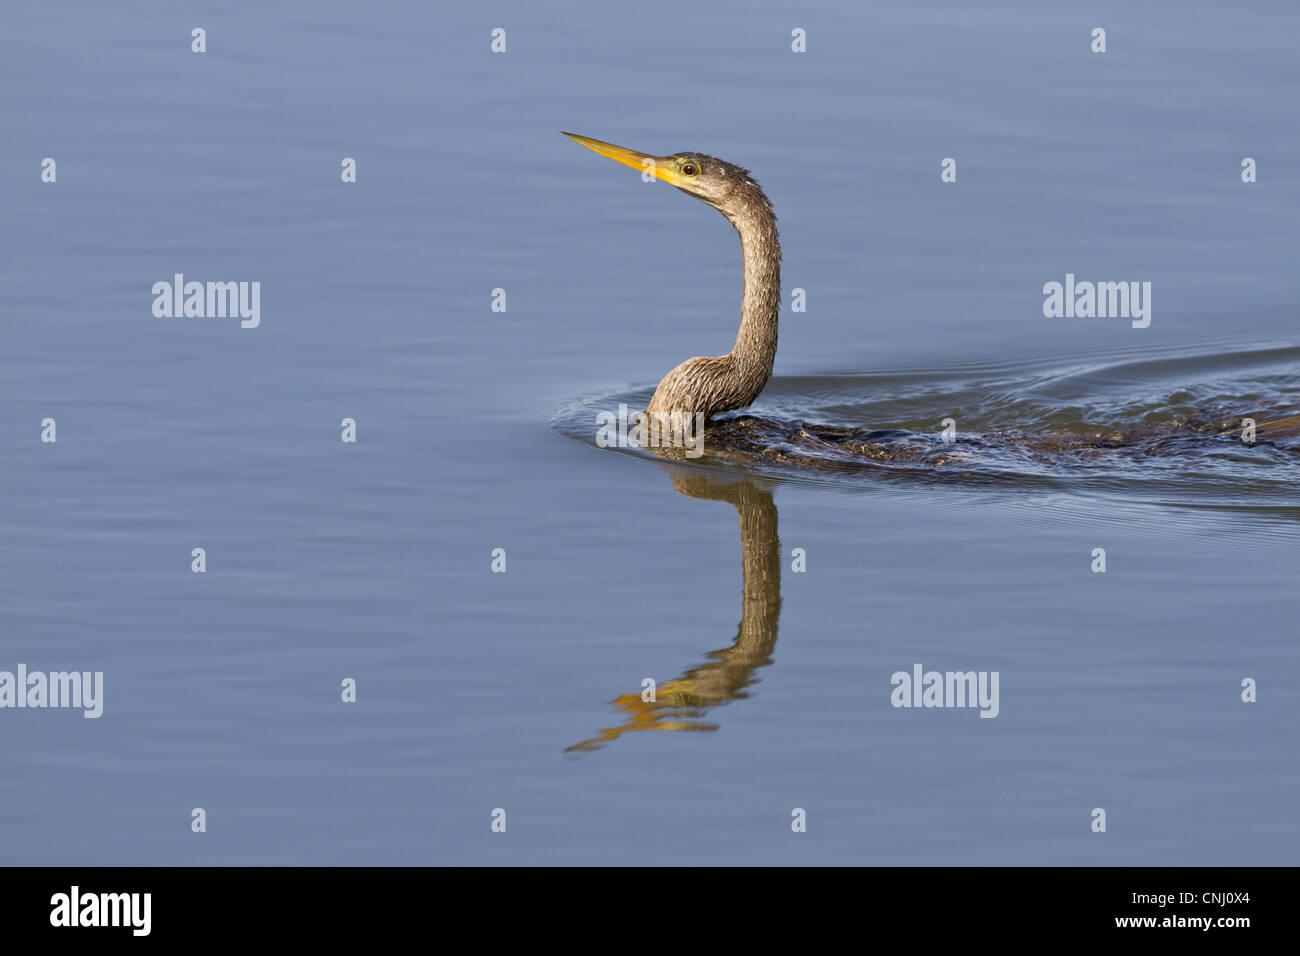 Anhinga (Anhinga anhinga) immature, swimming, Ding Darling Wildlife Refuge, Sanibel Island, Florida, U.S.A. - Stock Image